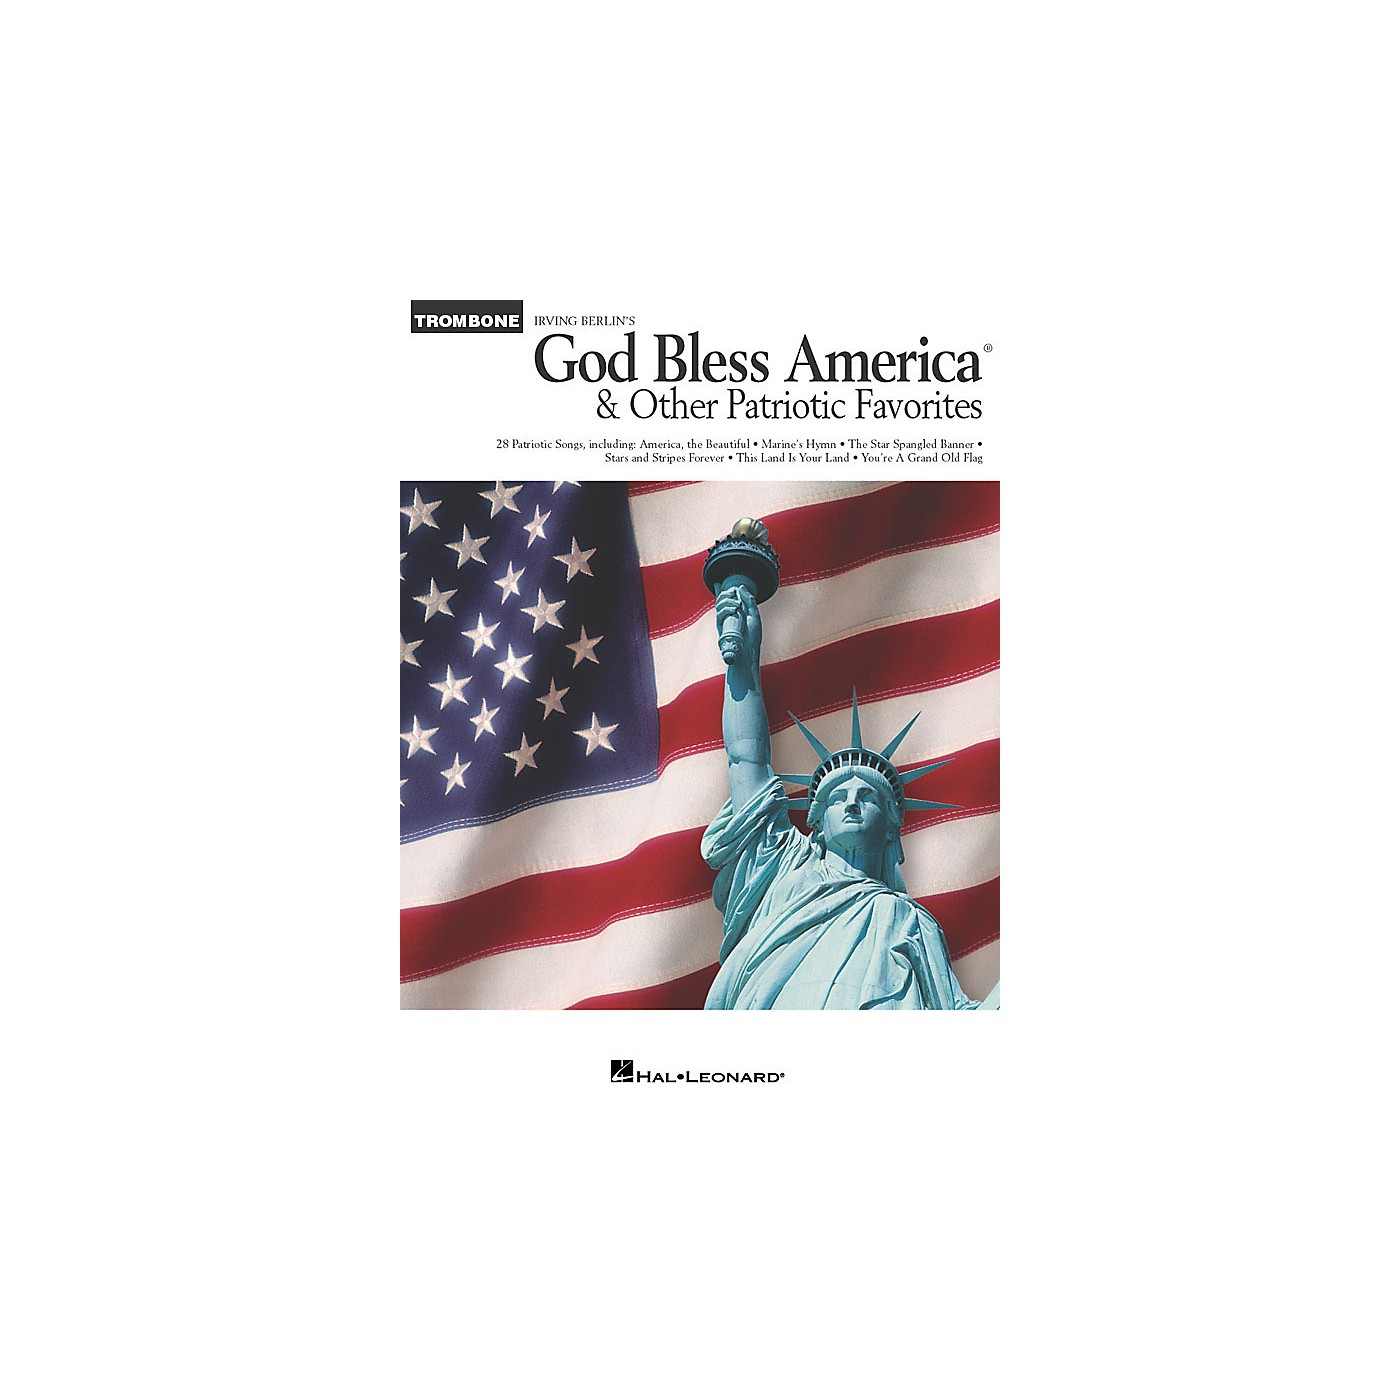 Hal Leonard God Bless America® and Other Patriotic Favorites (Trombone) Instrumental Folio Series thumbnail